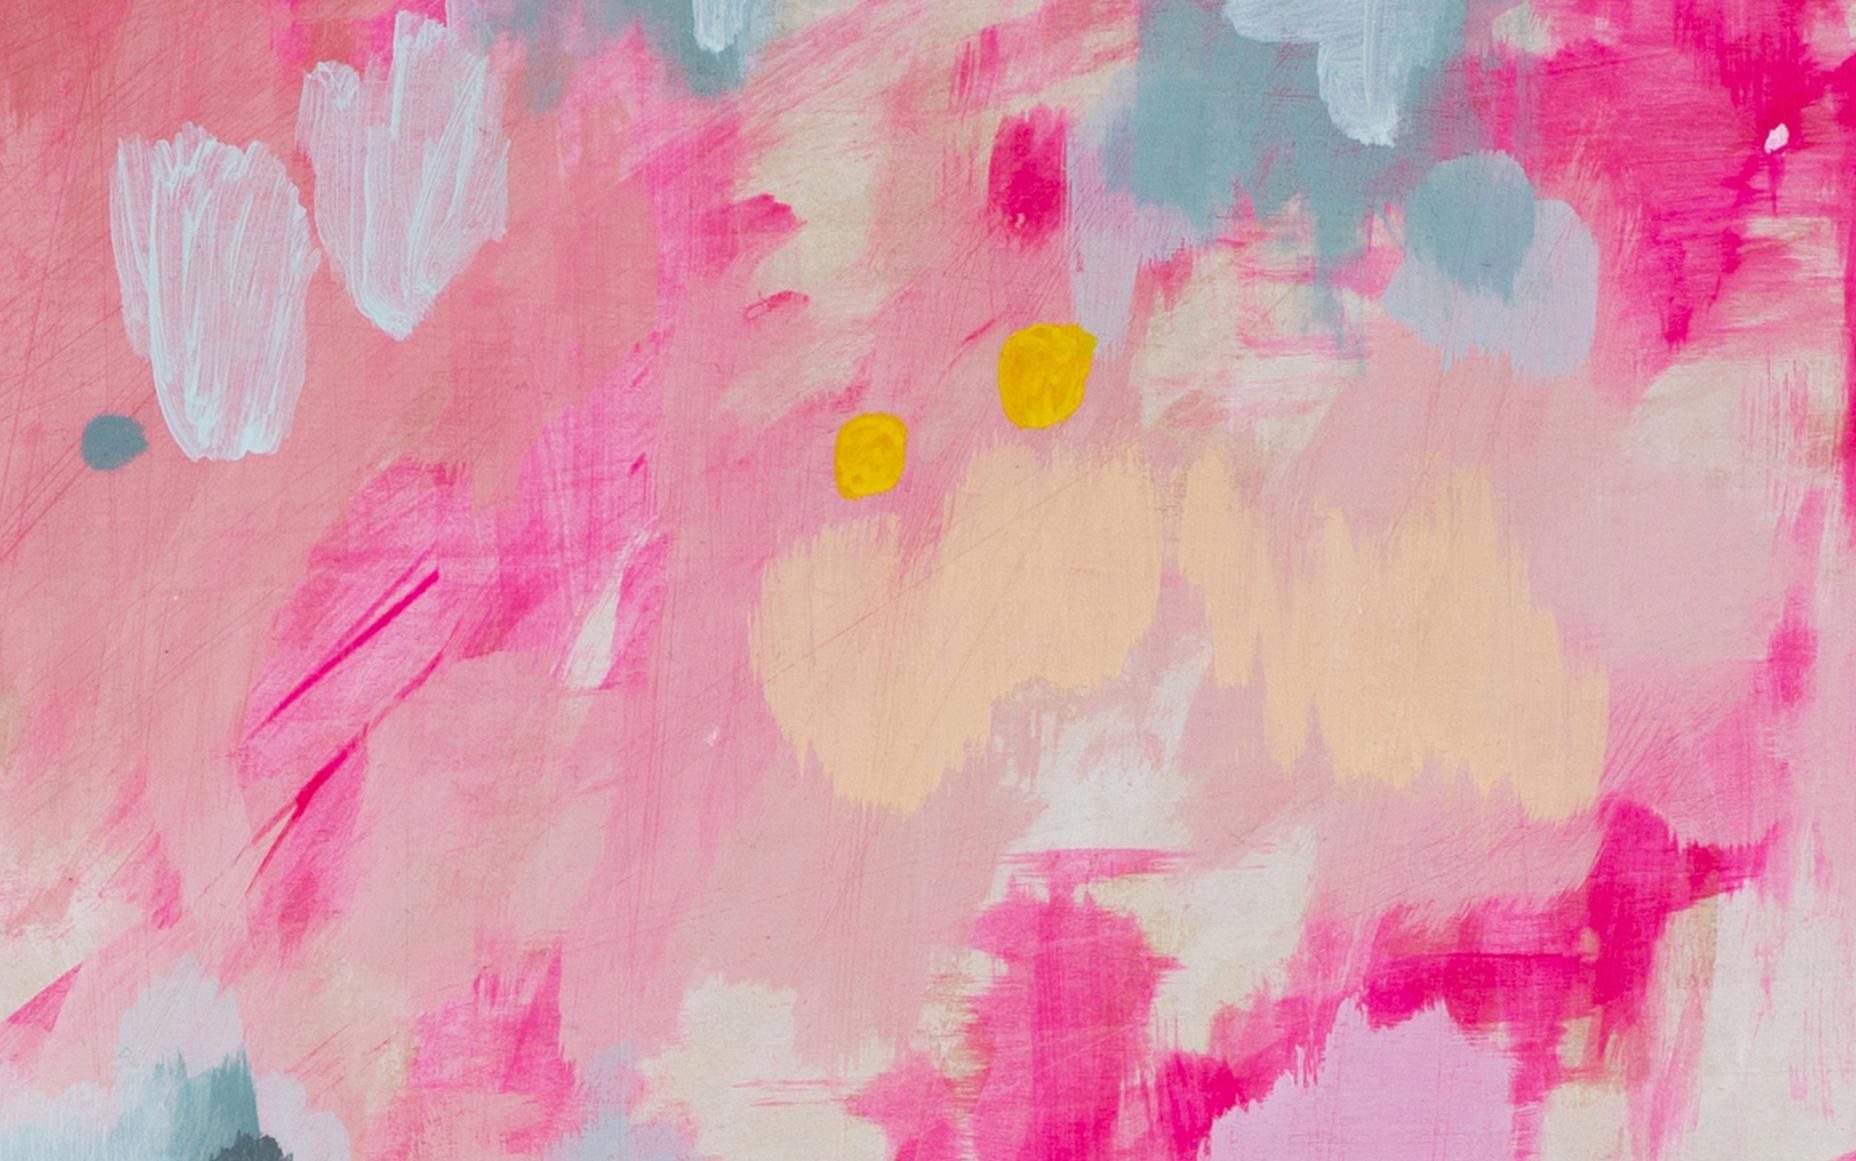 1000 Ideas About Hd Images On Pinterest: Pretty Desktop Wallpaper